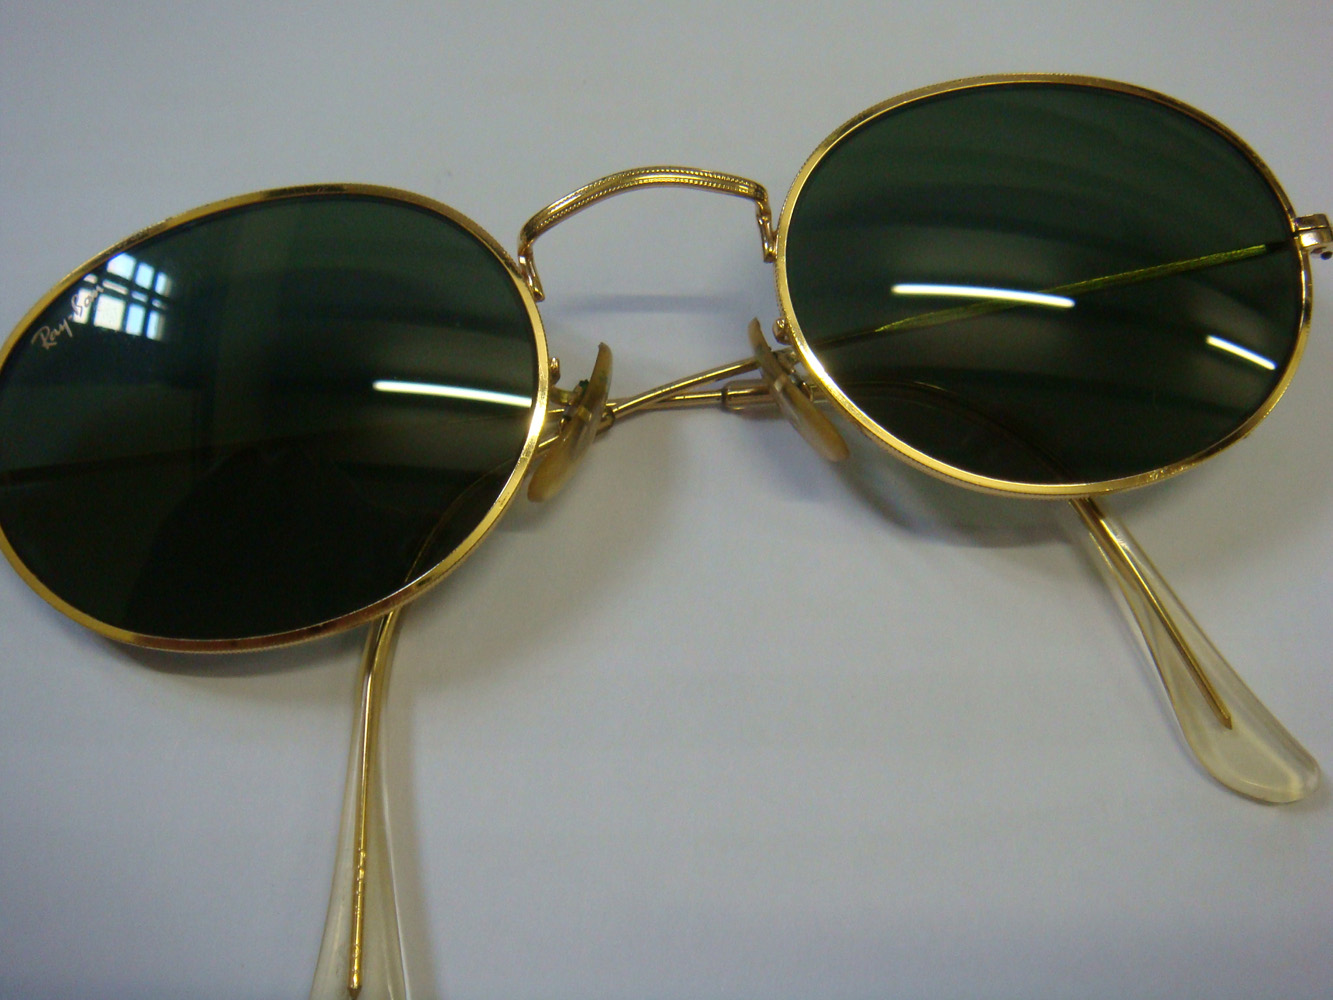 d1436c077b0 Ray Ban John Lennon Sunglasses « Heritage Malta